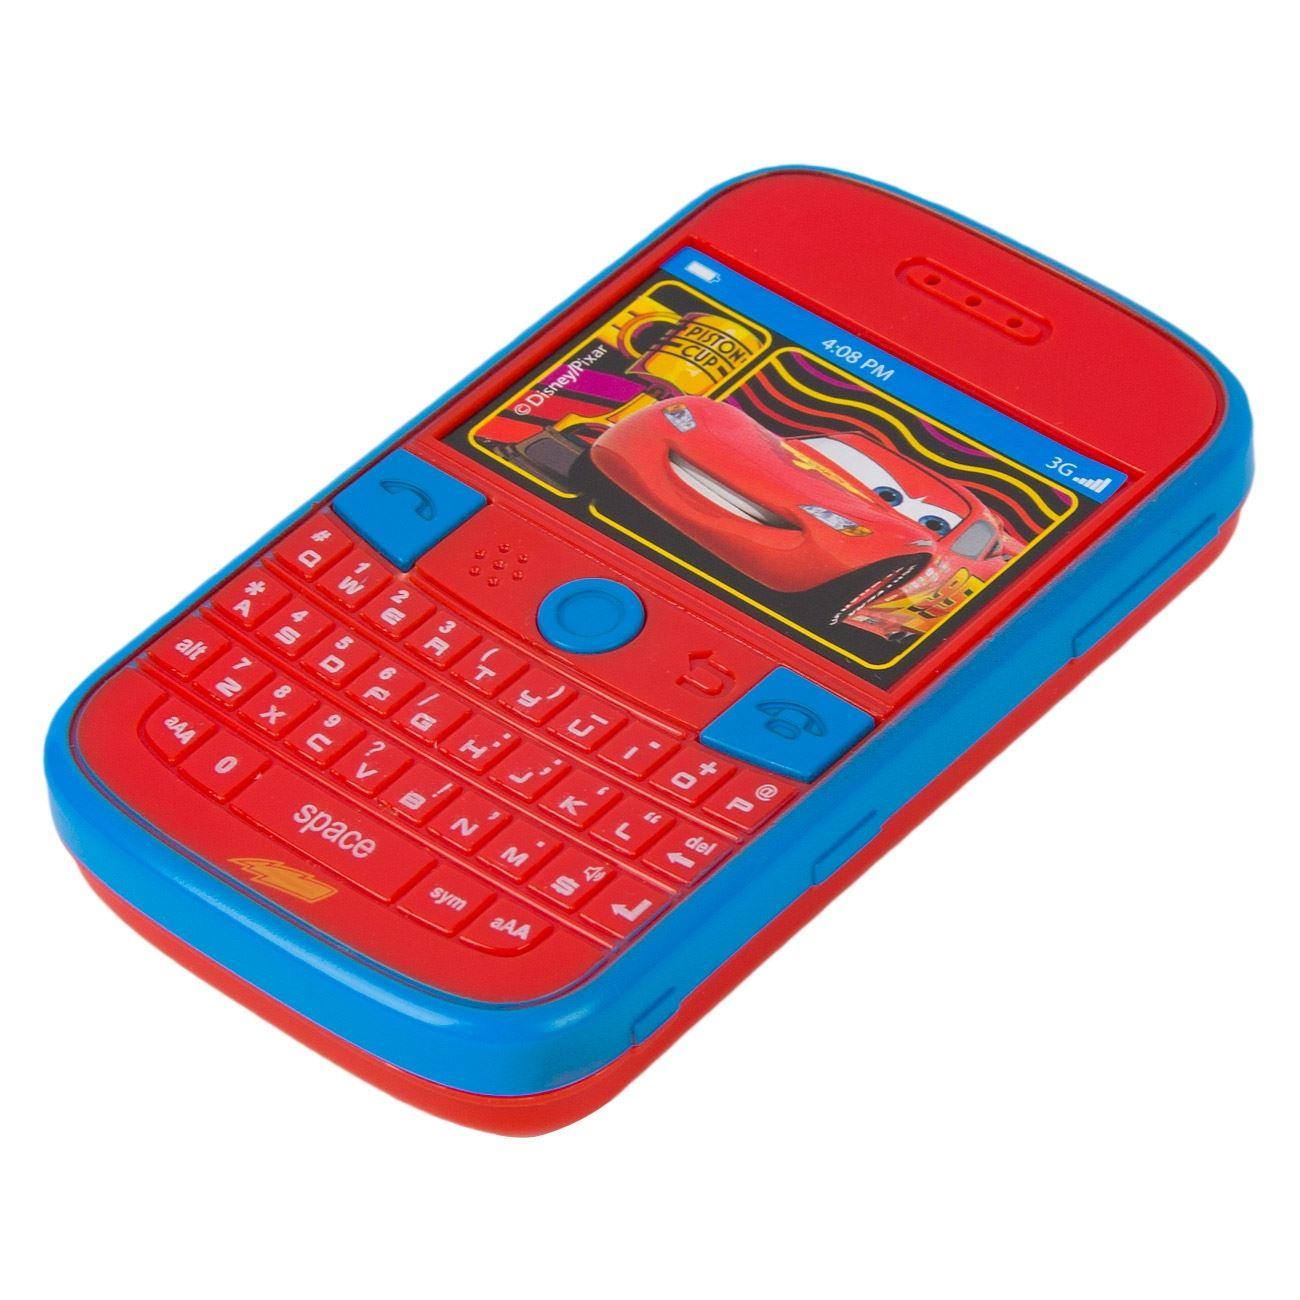 36473f1c70a1 Αληθοφανές Κινητό Τηλέφωνο CARS - AS   Αληθοφανή Κινητά